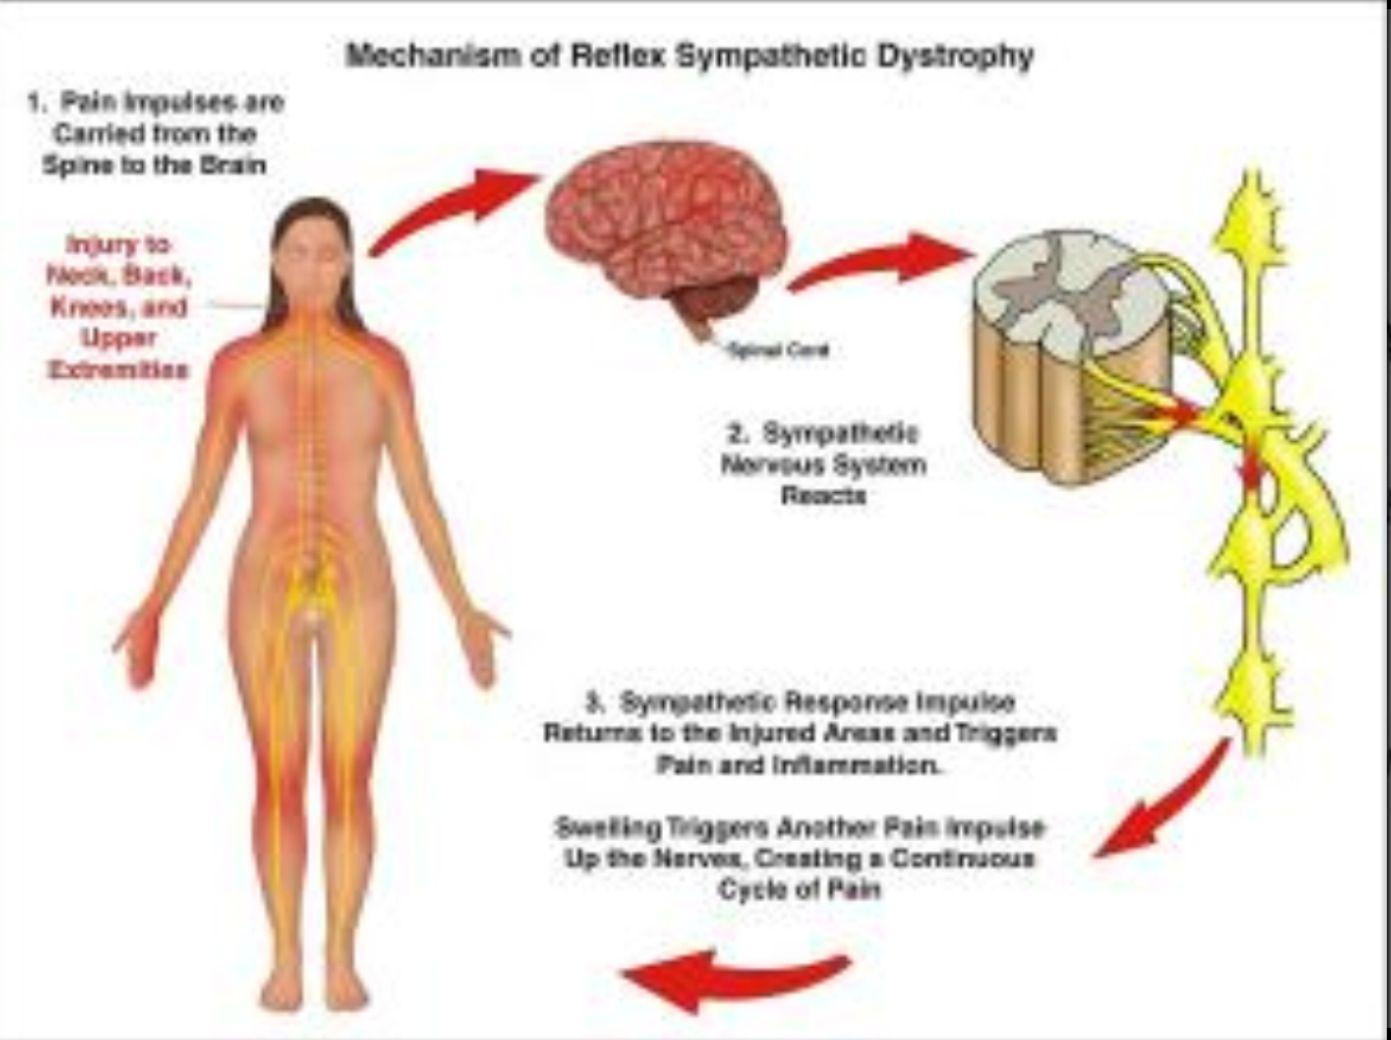 crps rsd pain scale affect me complex regional pain syndrome chronic illness [ 1391 x 1040 Pixel ]